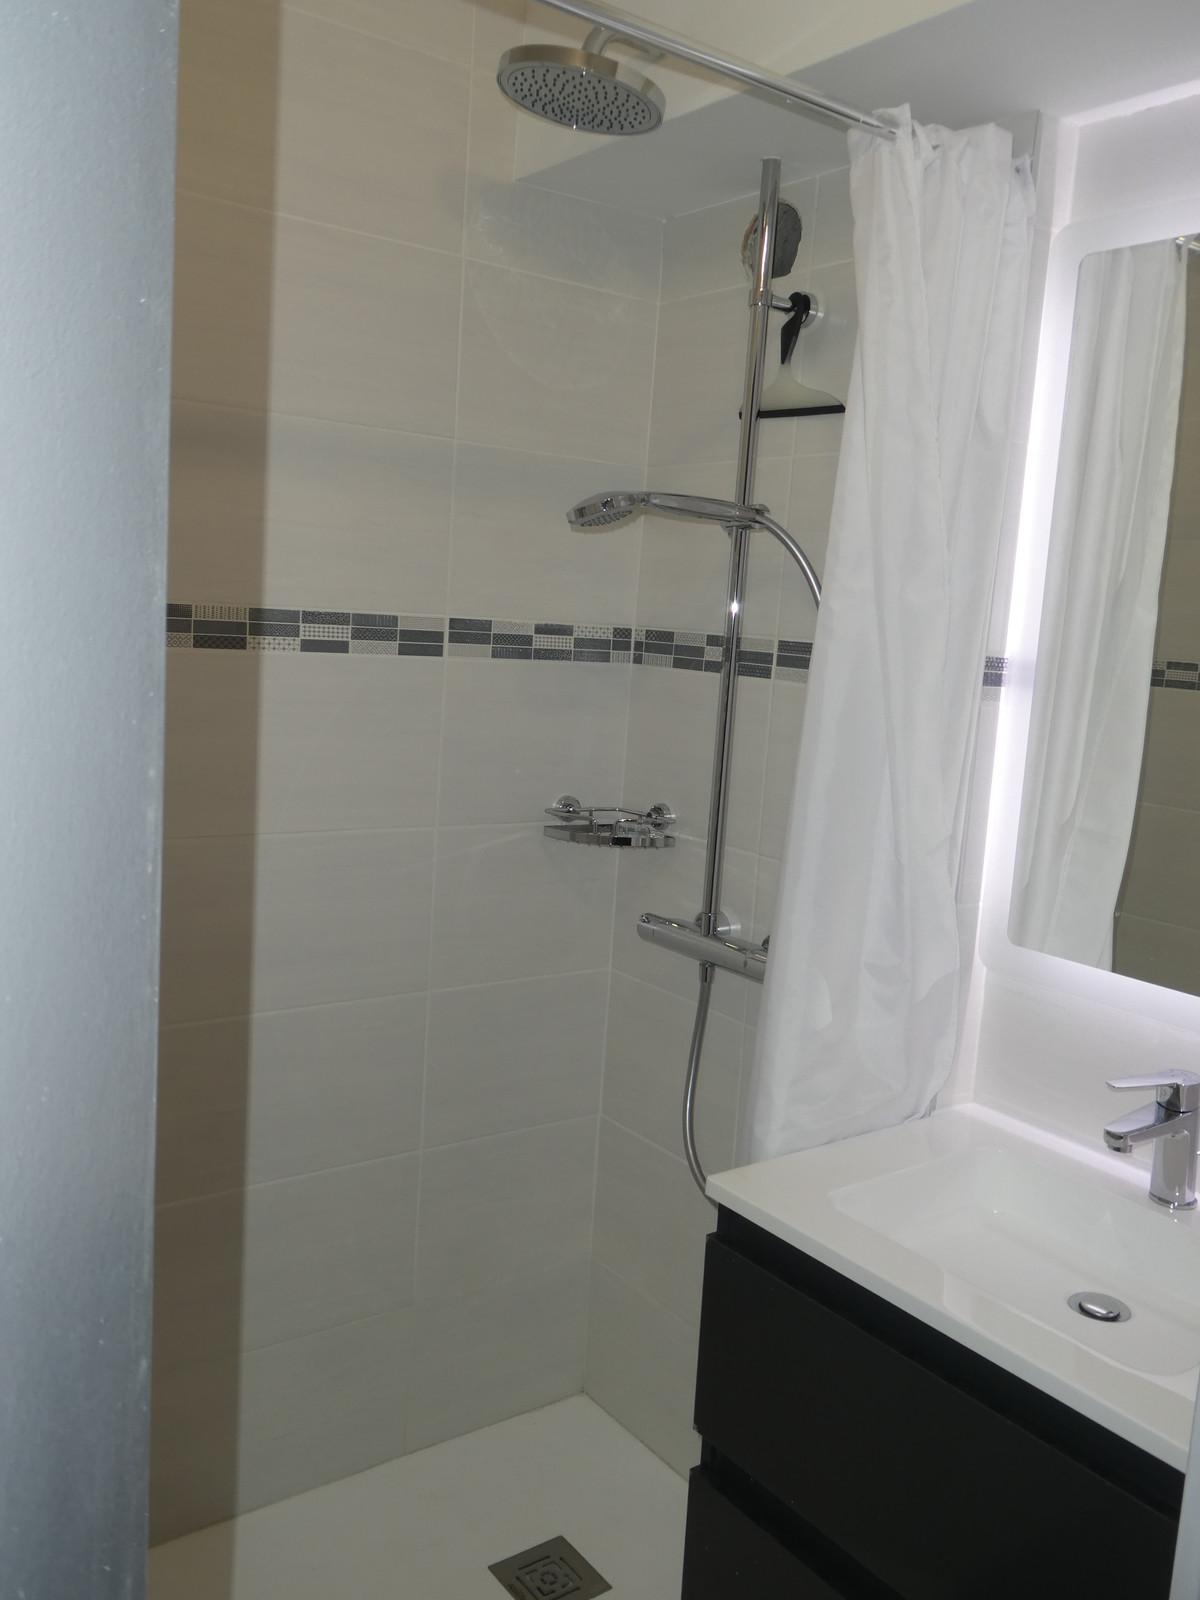 Salle De Bain Faience Grise salle de bain carrelage gris